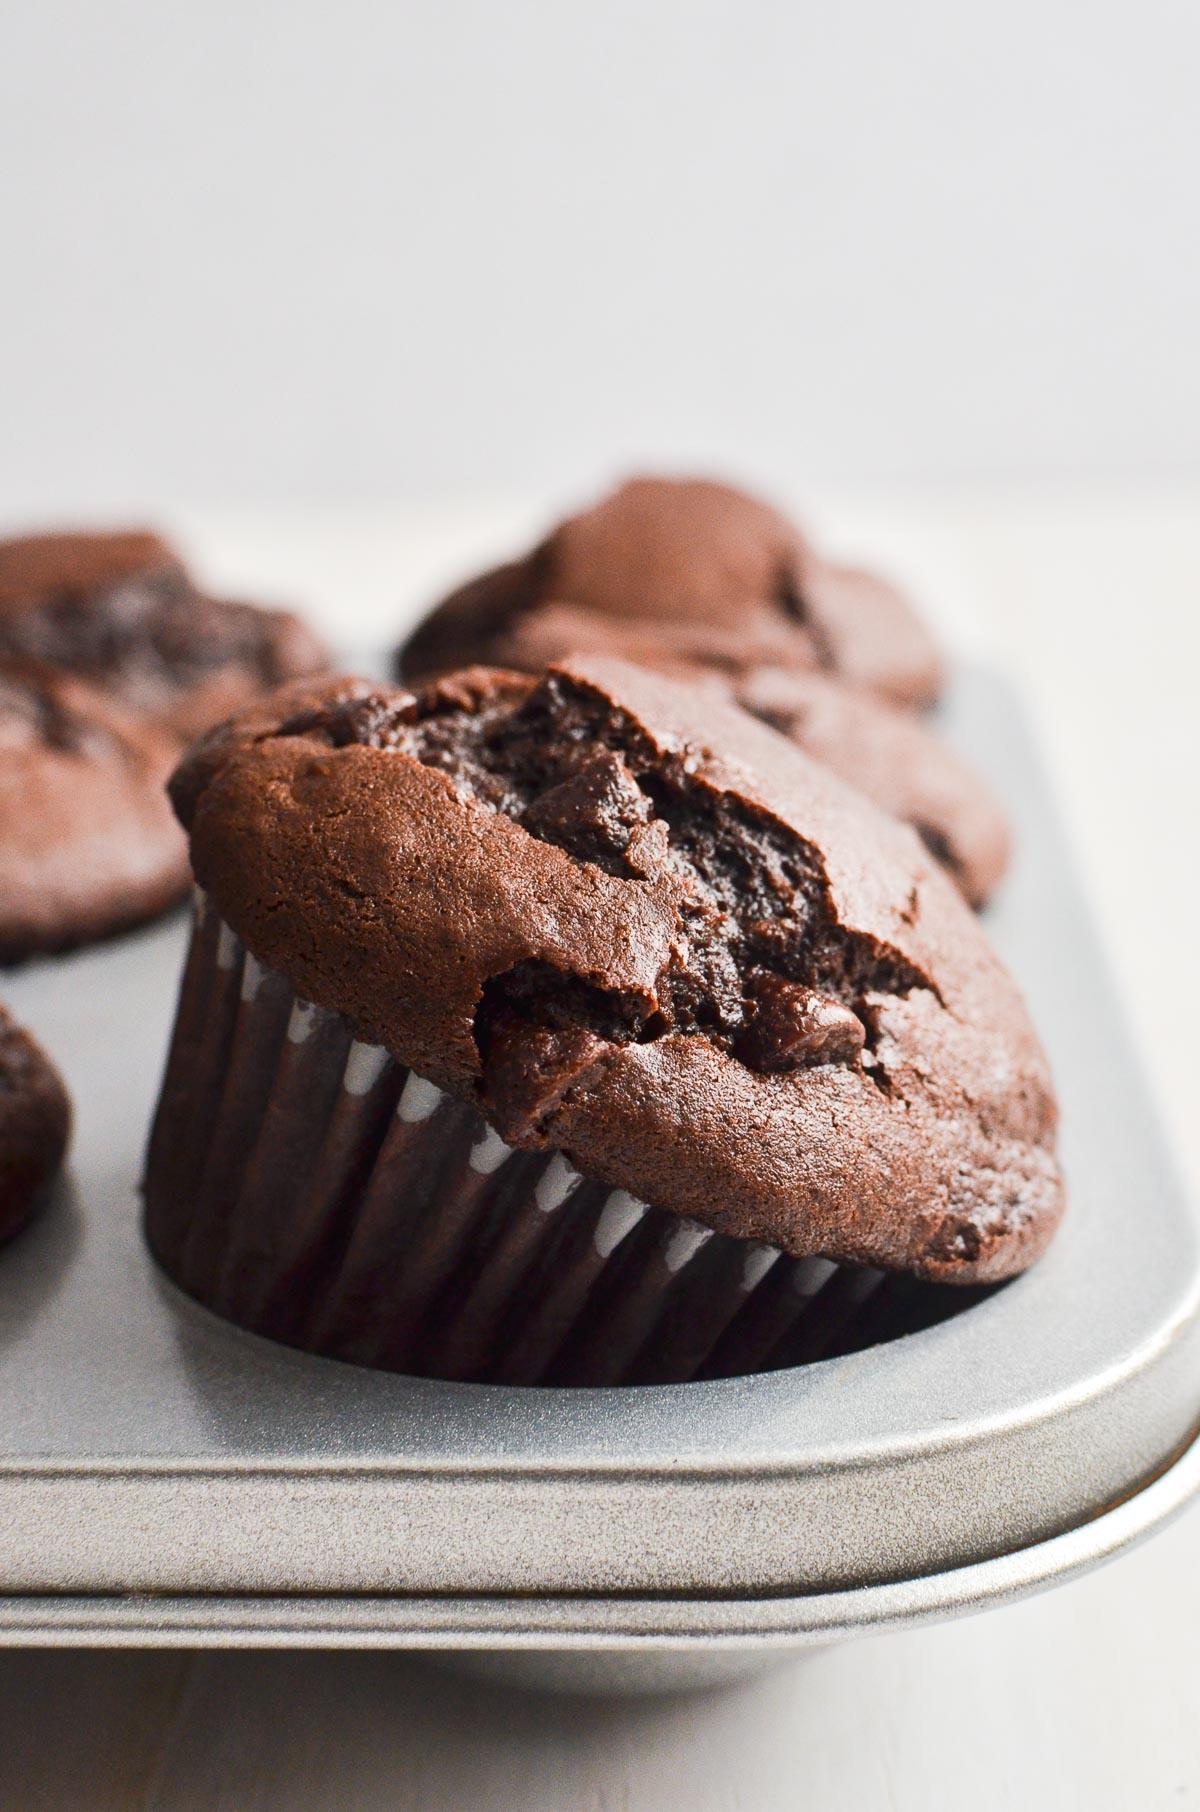 chocolate muffin in a muffin pan